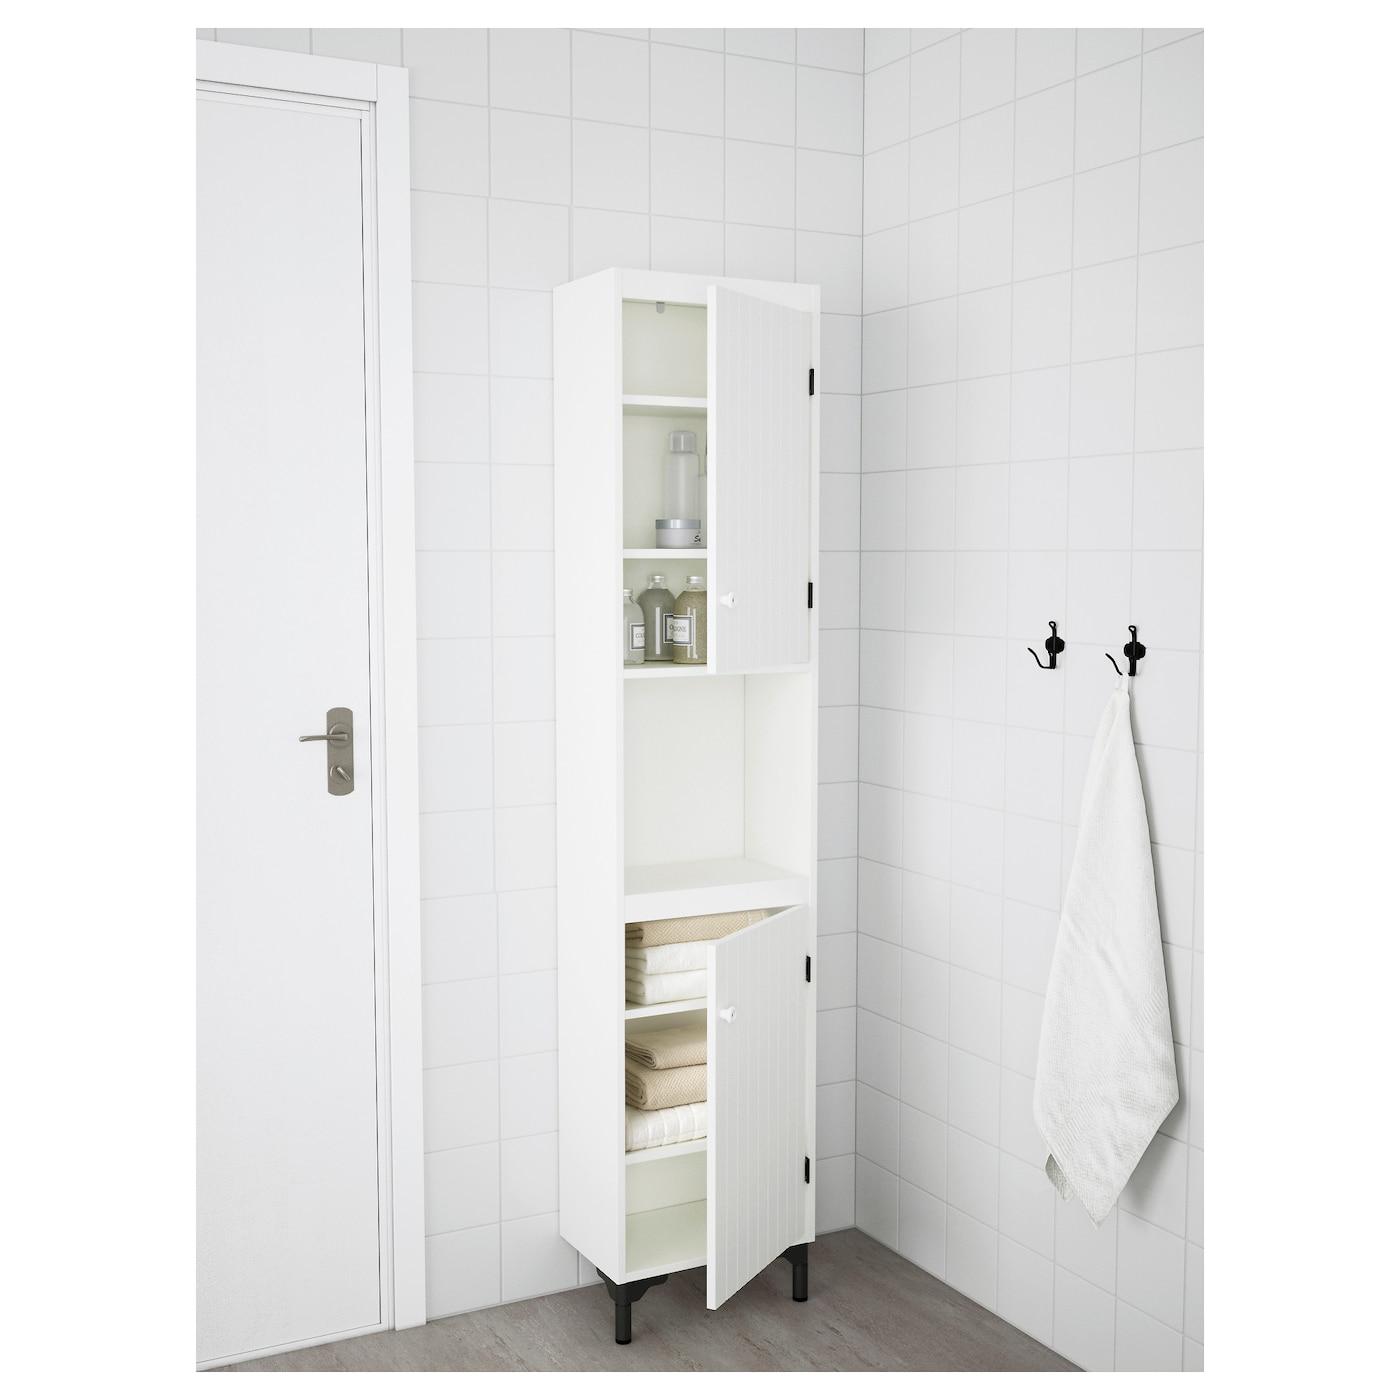 Ikea Kinderzimmer Jugendzimmer ~ IKEA SILVERÅN high cabinet with 2 doors You can mount the door to